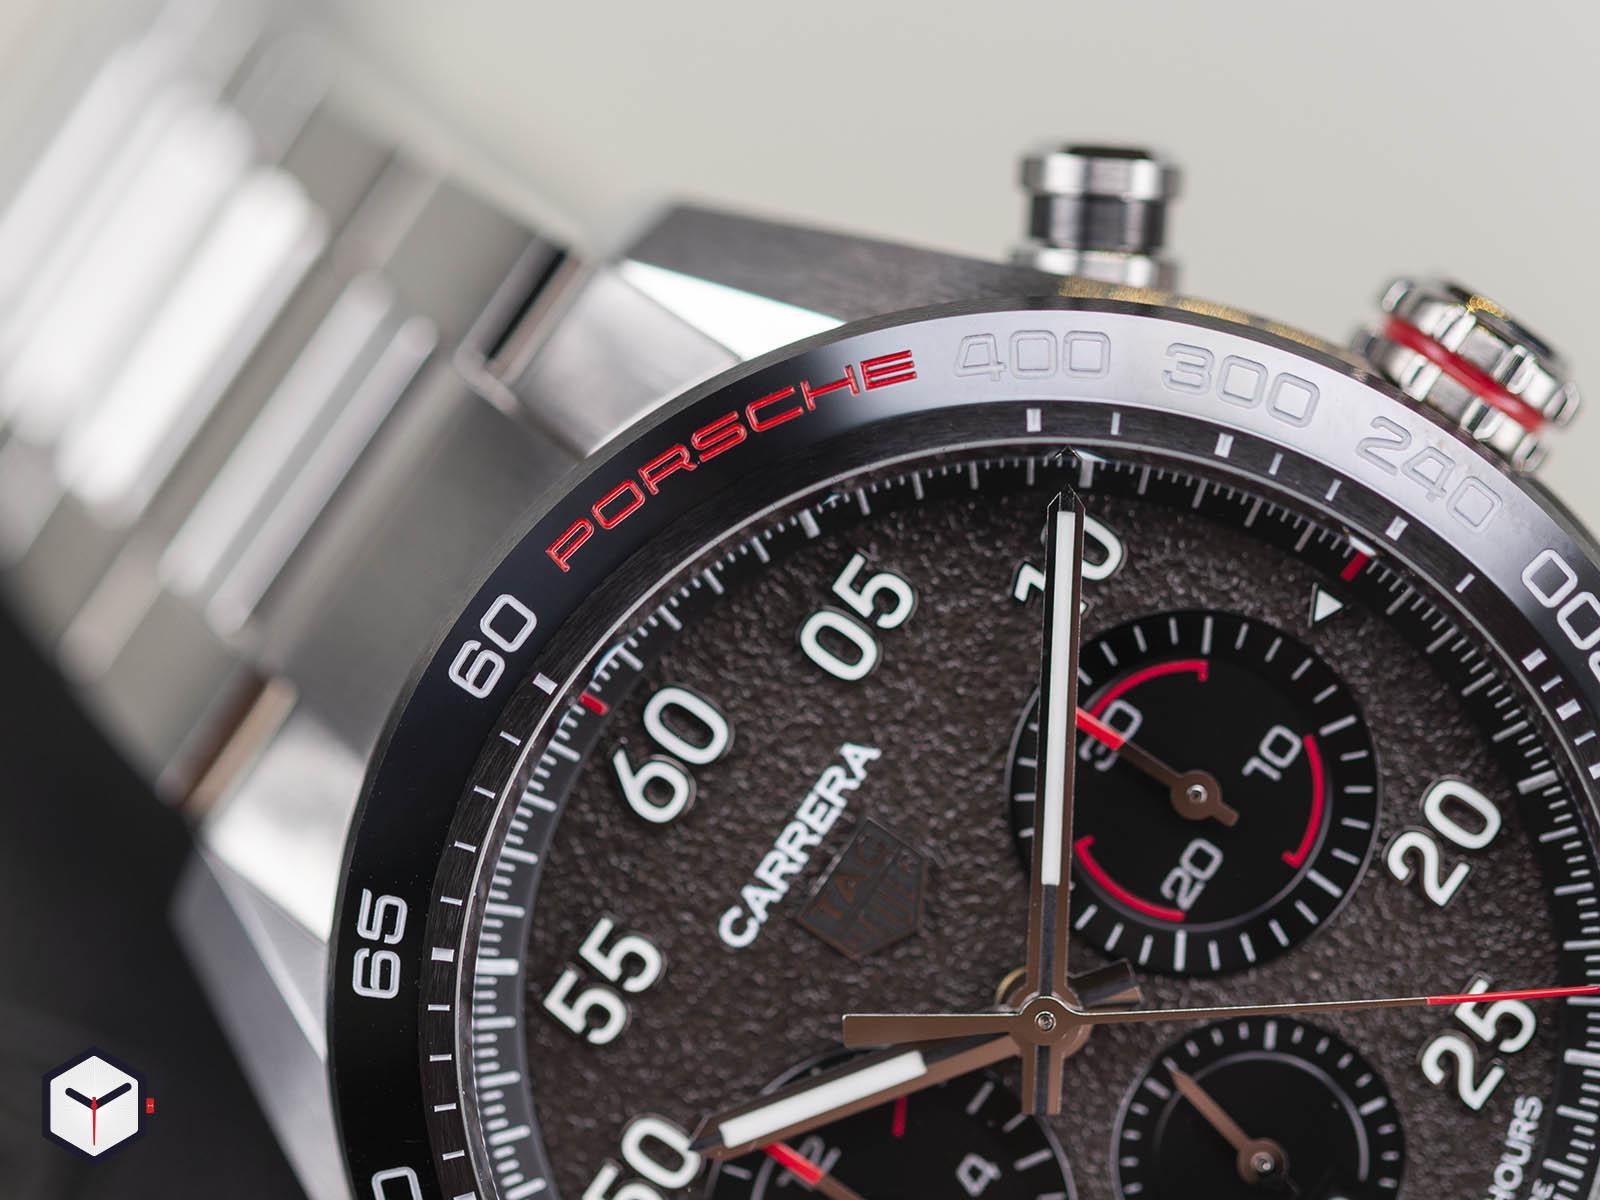 cbn2a1f-ba0643-tag-heuer-carrera-porsche-chronograph-1-3.jpg